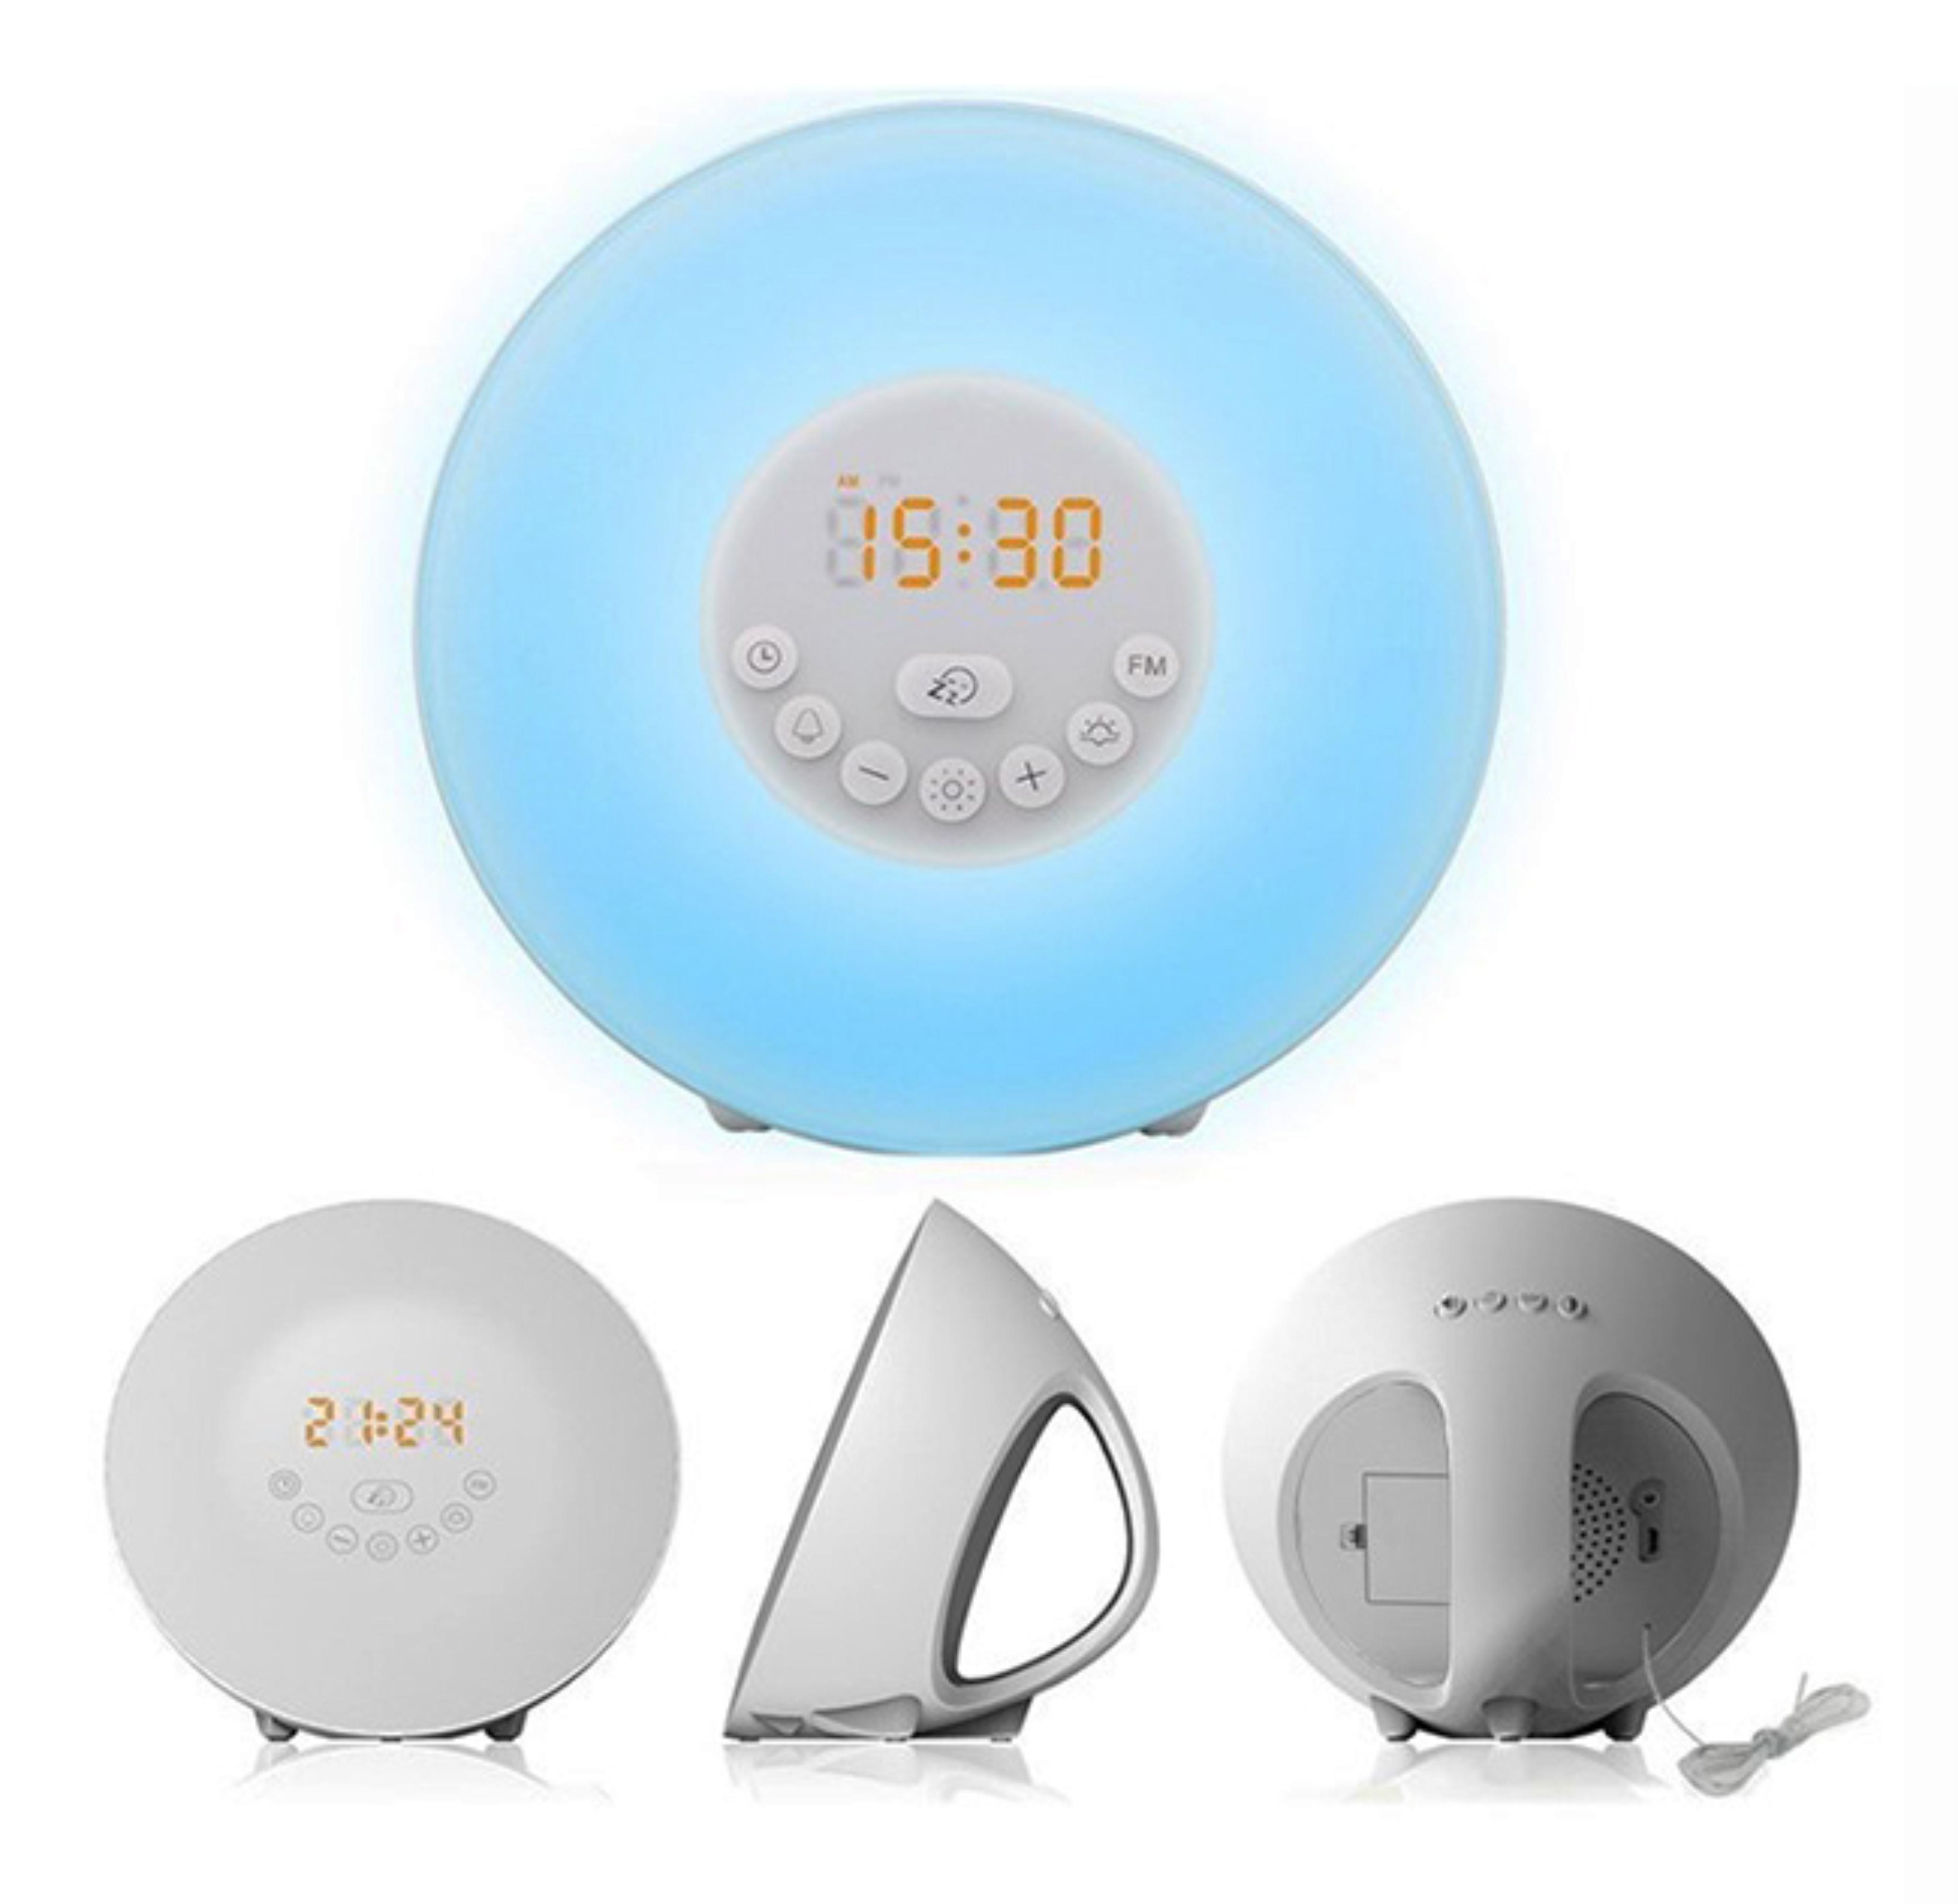 Boxa Bluetooth cu lampa, alarma si radio FM RedSun 6640C